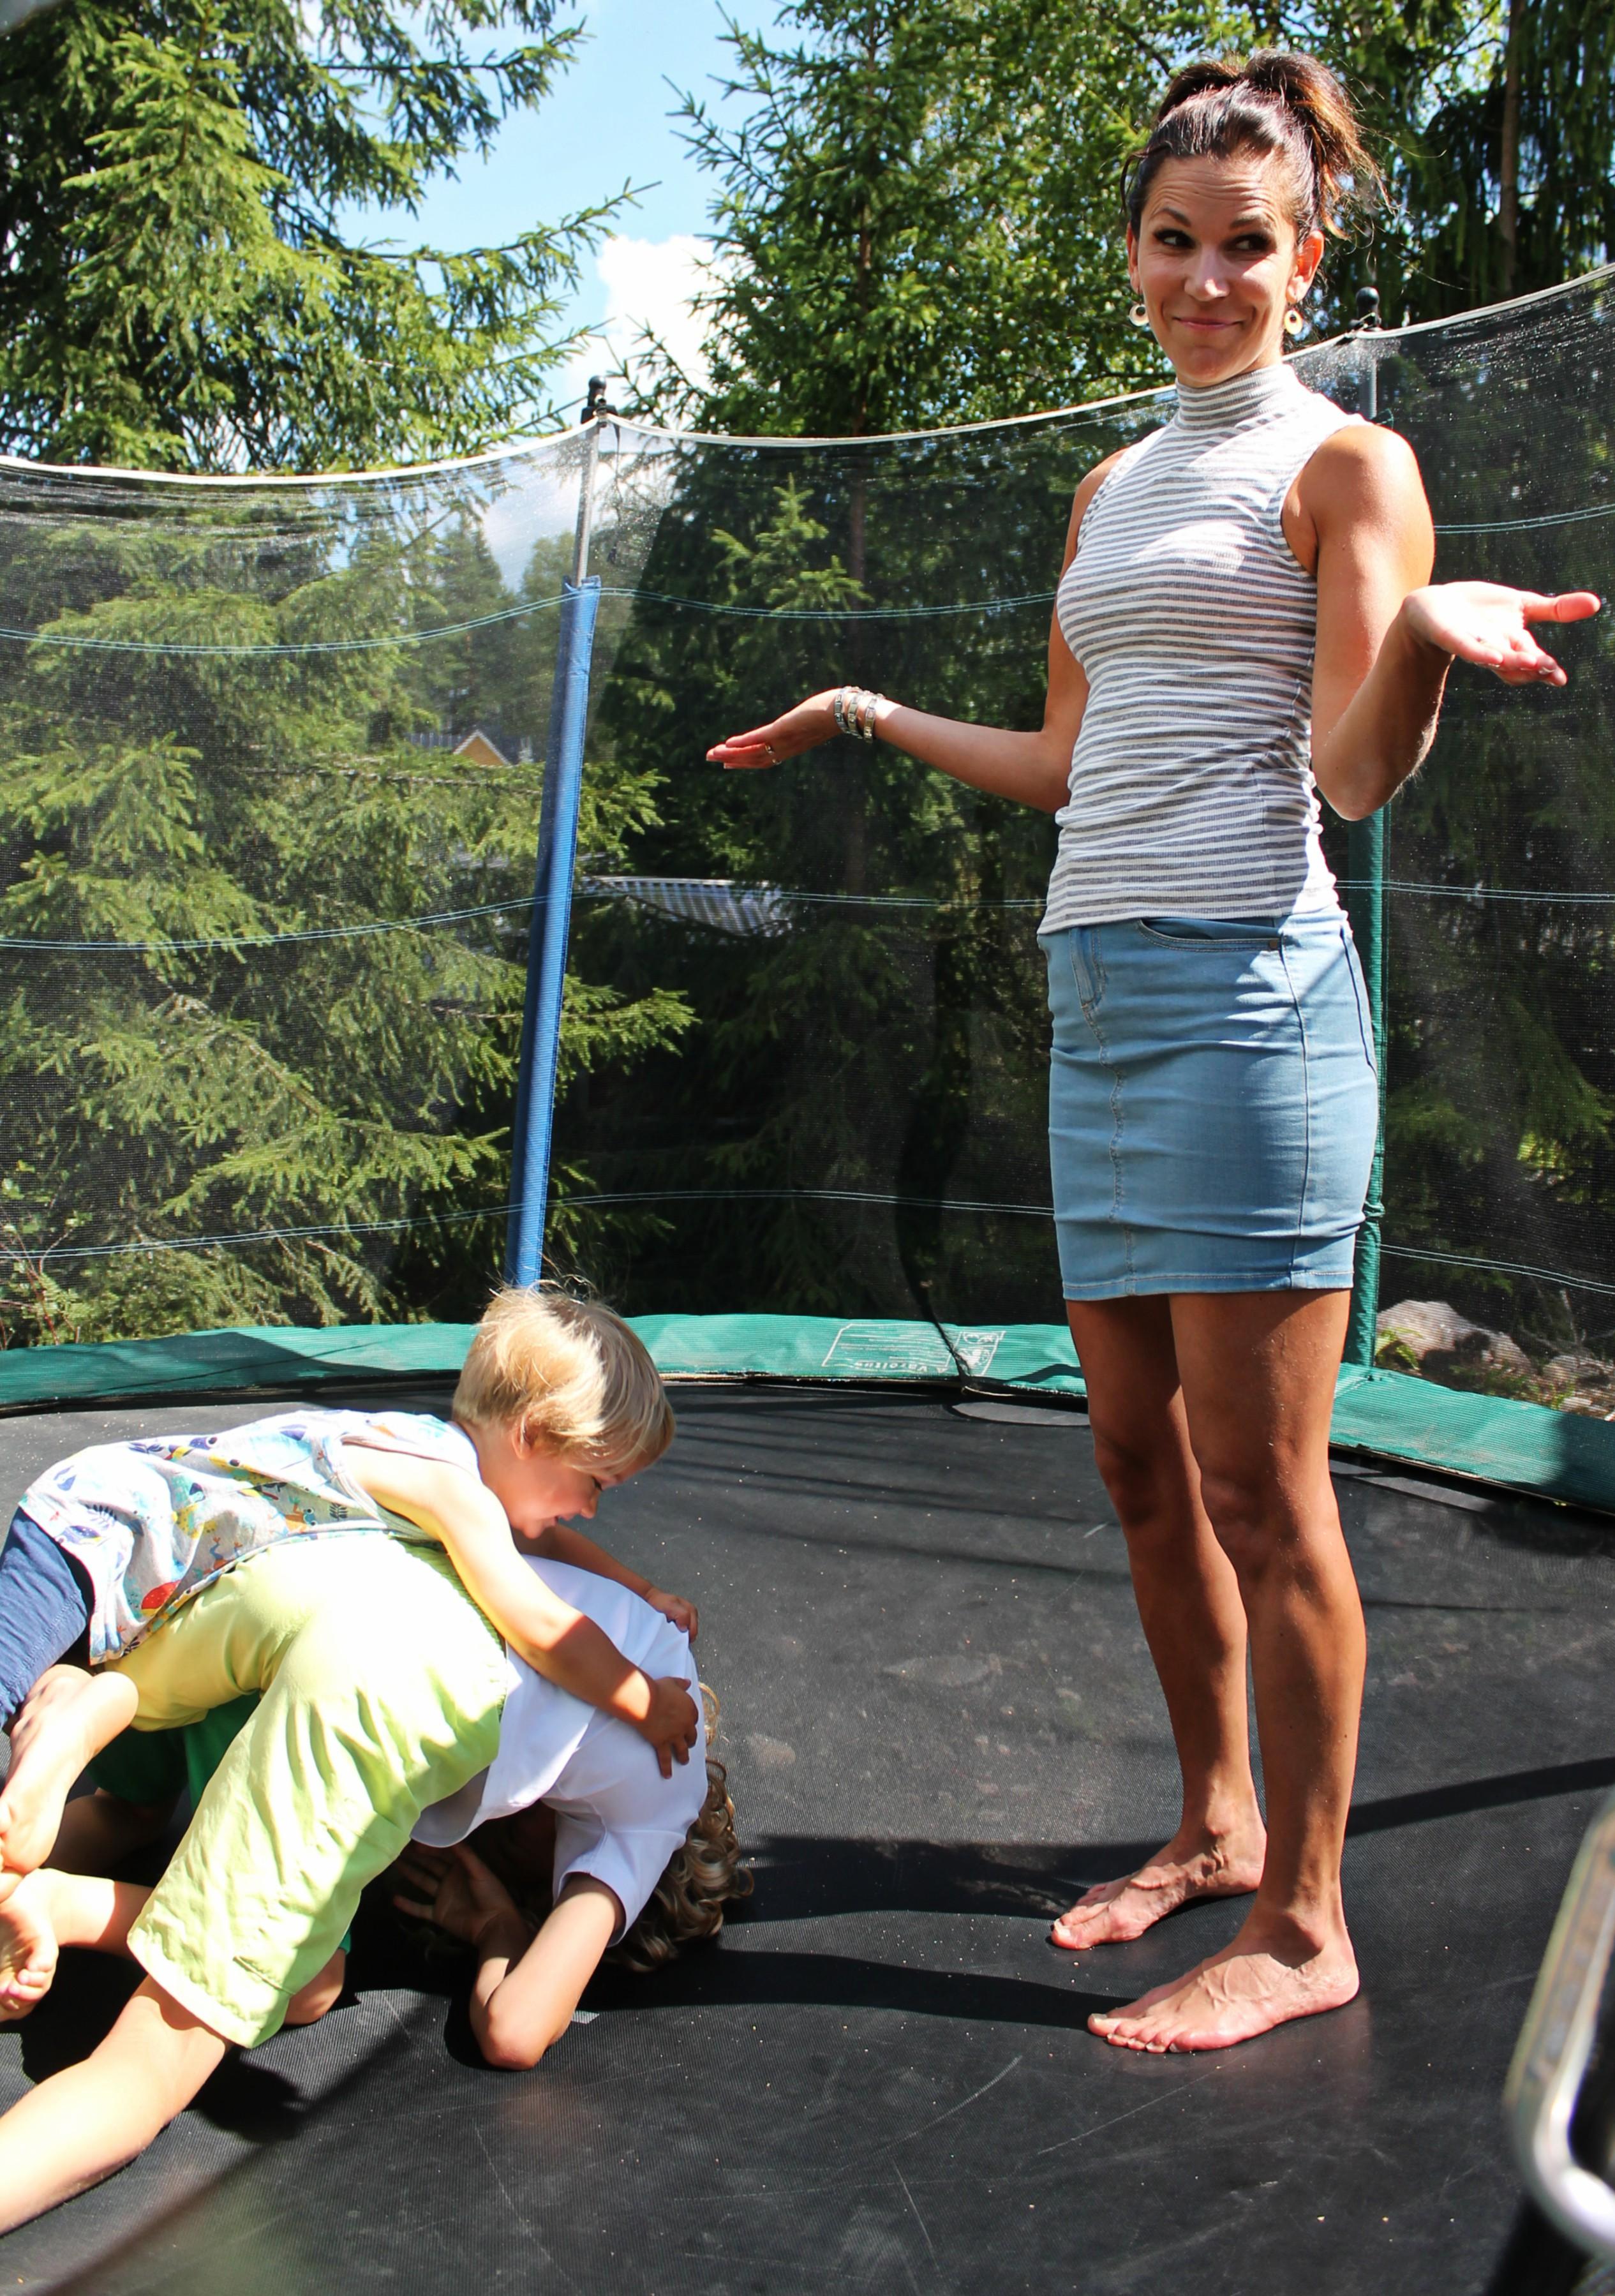 pojat painii trampalla